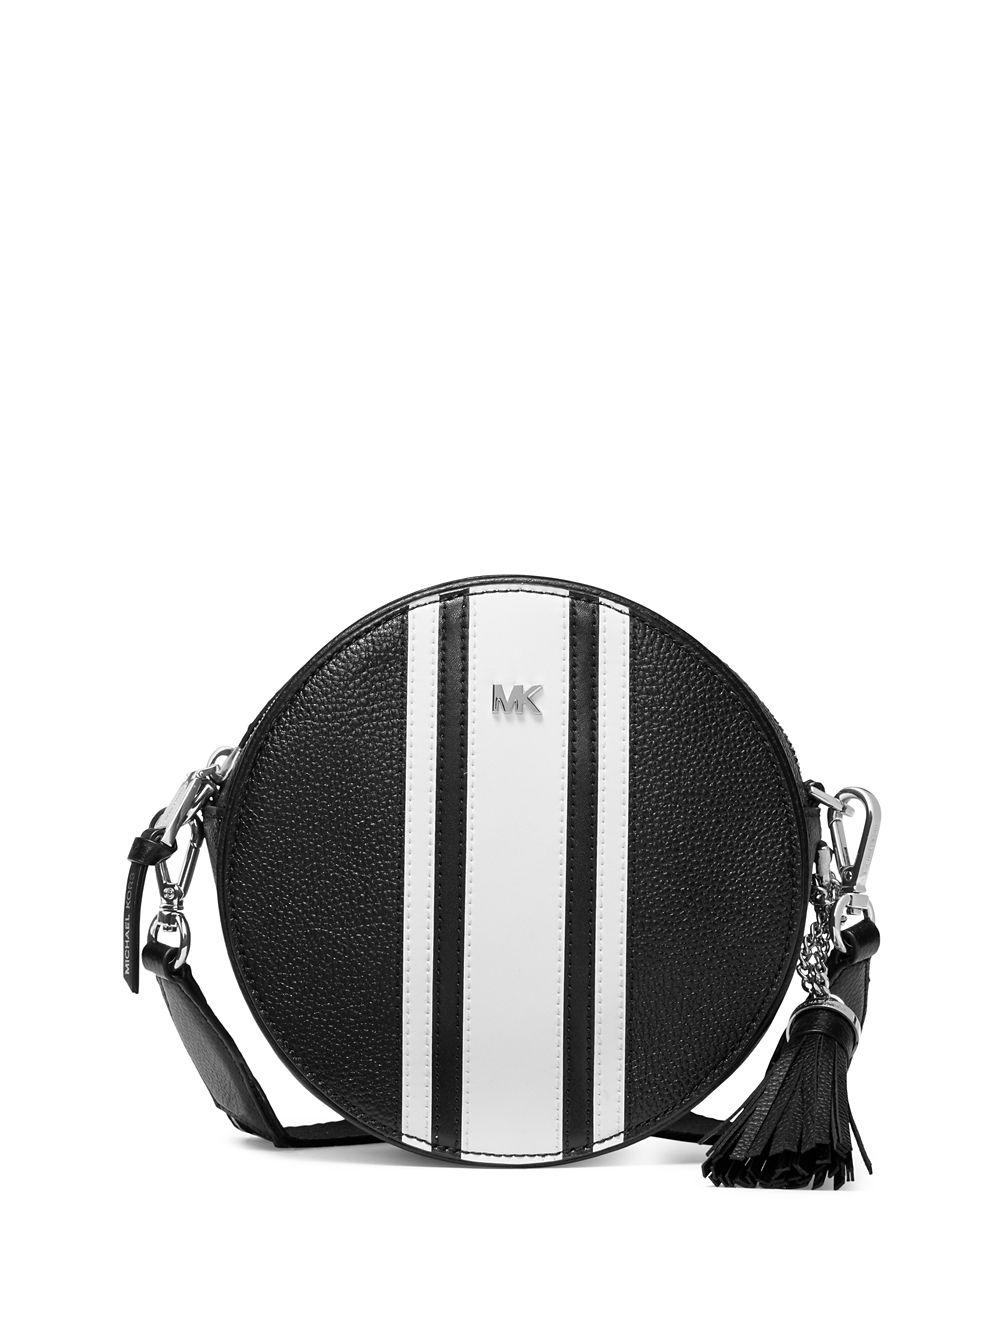 d975a5945a4f ... hot lyst michael kors medium striped crossbody can bag in 54181 352e7